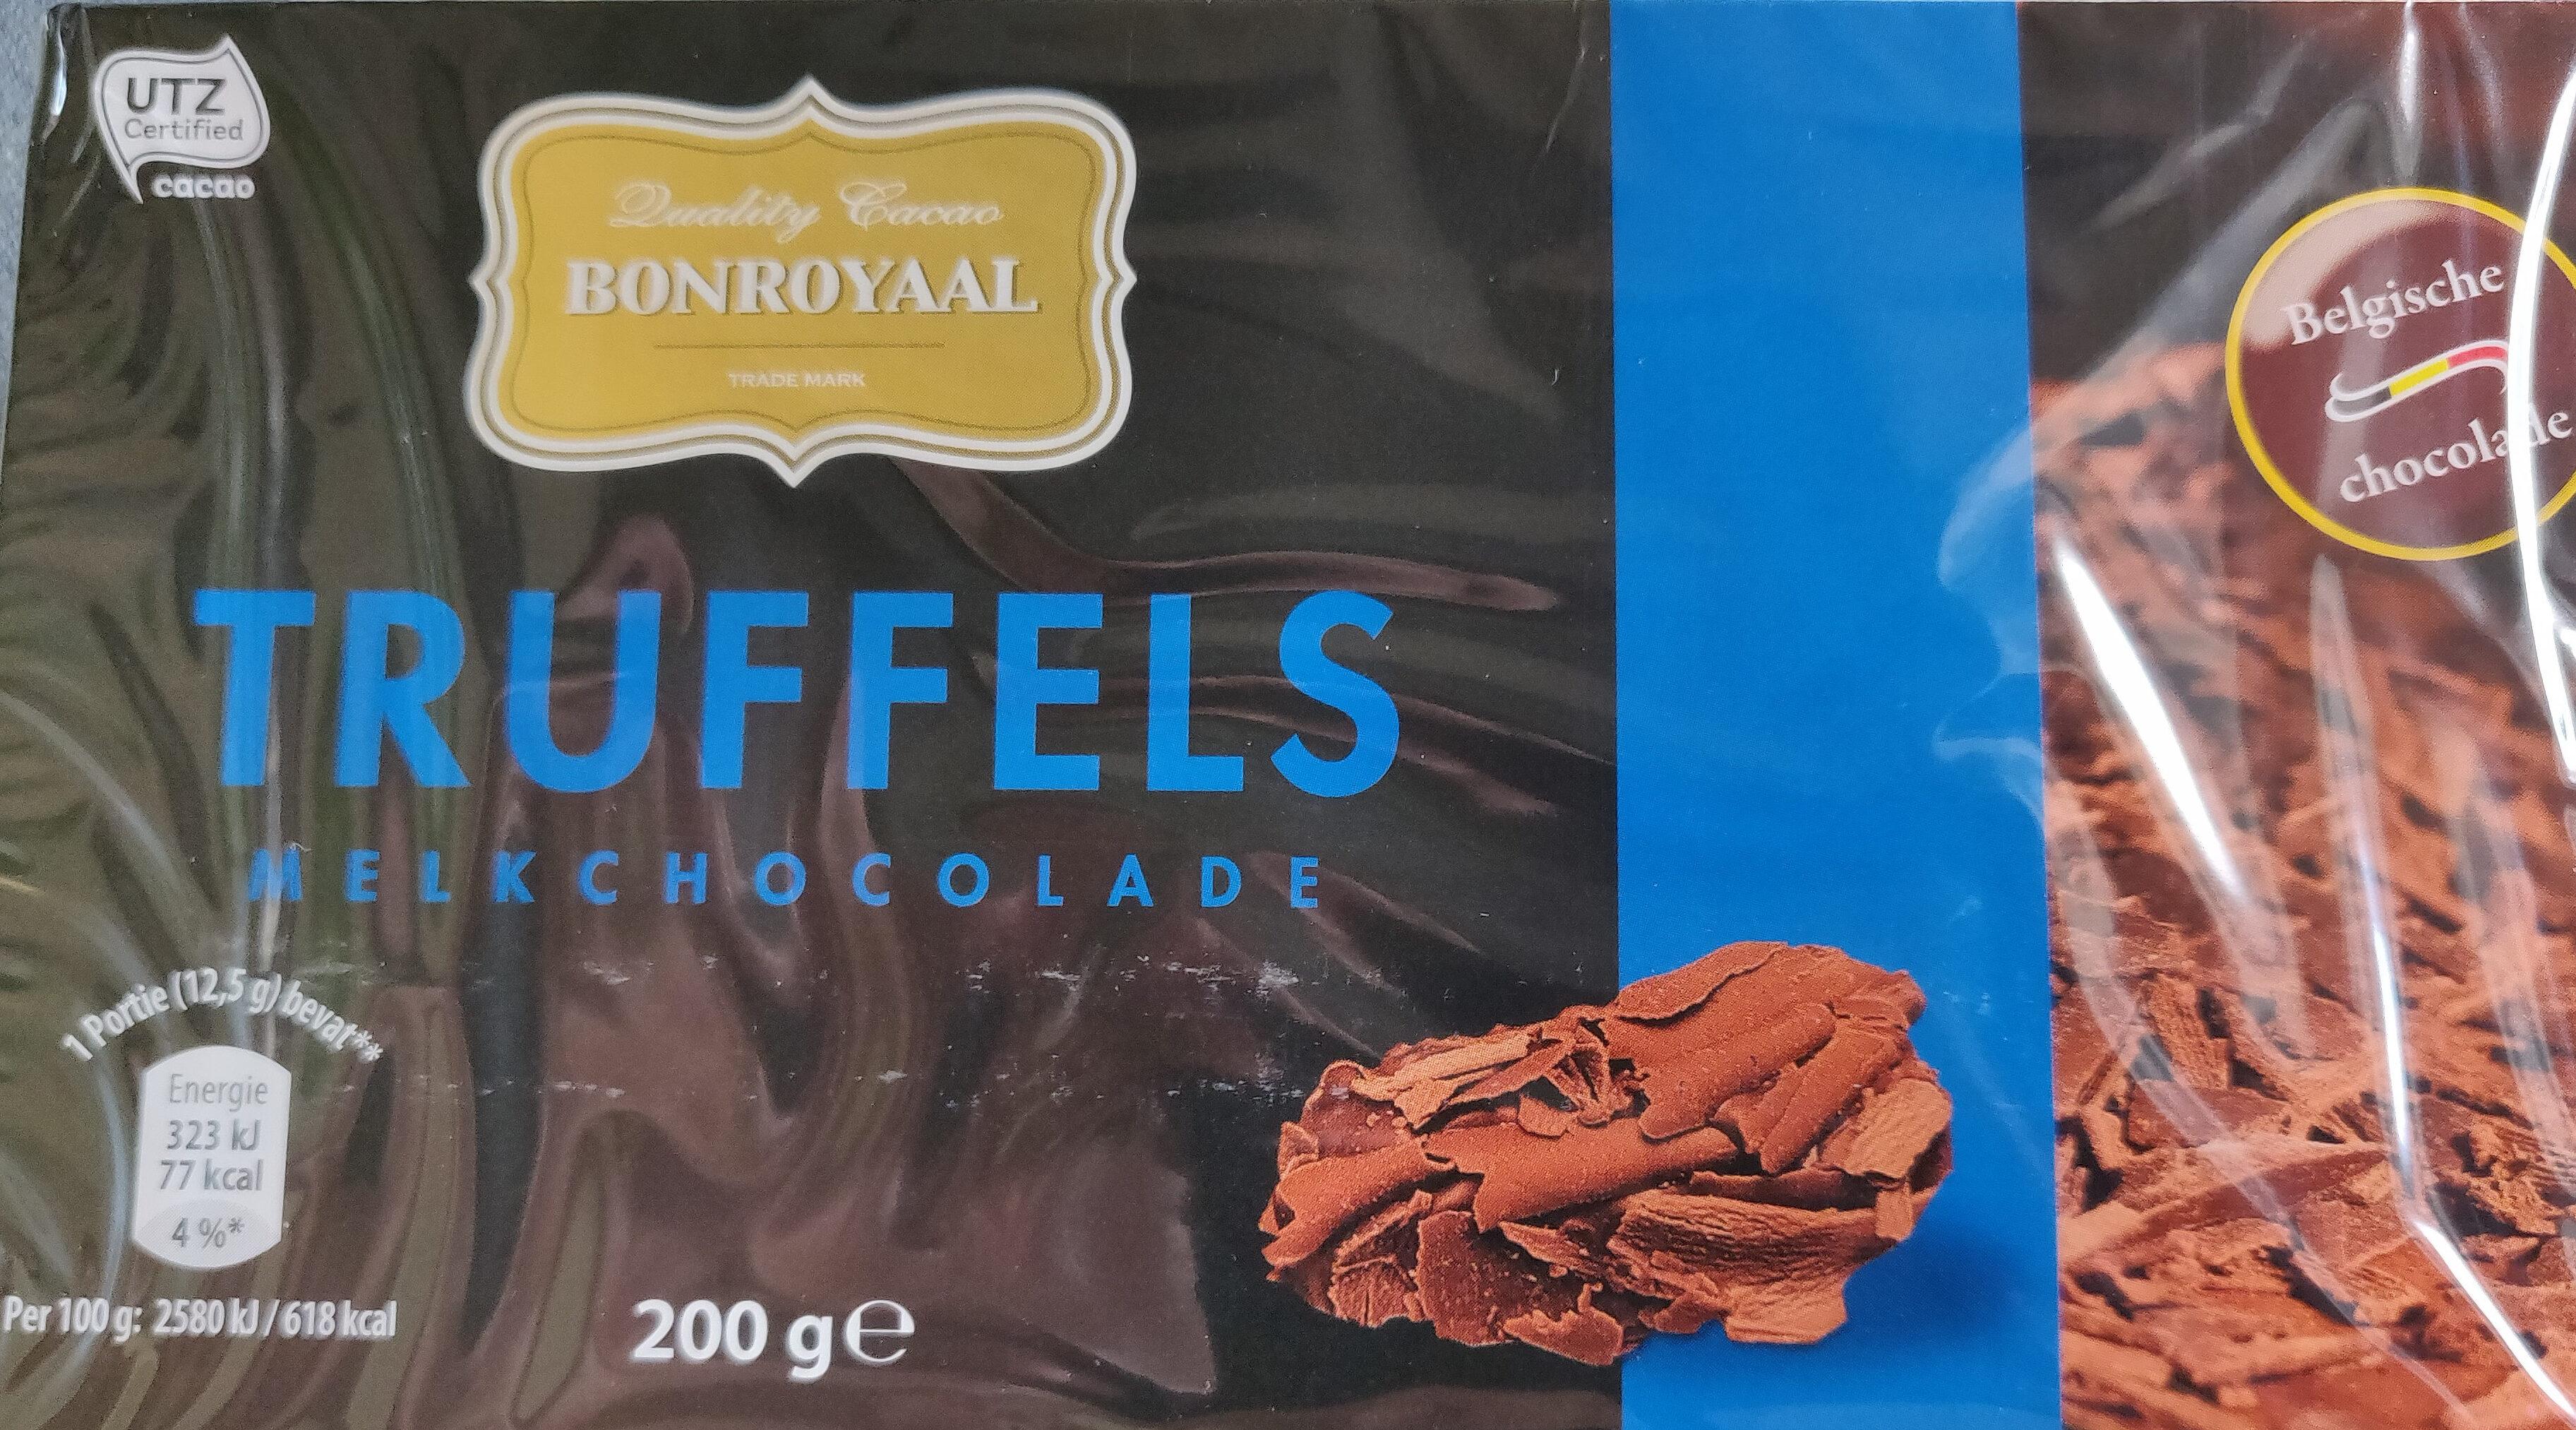 Truffels melkchocolade - Product - nl